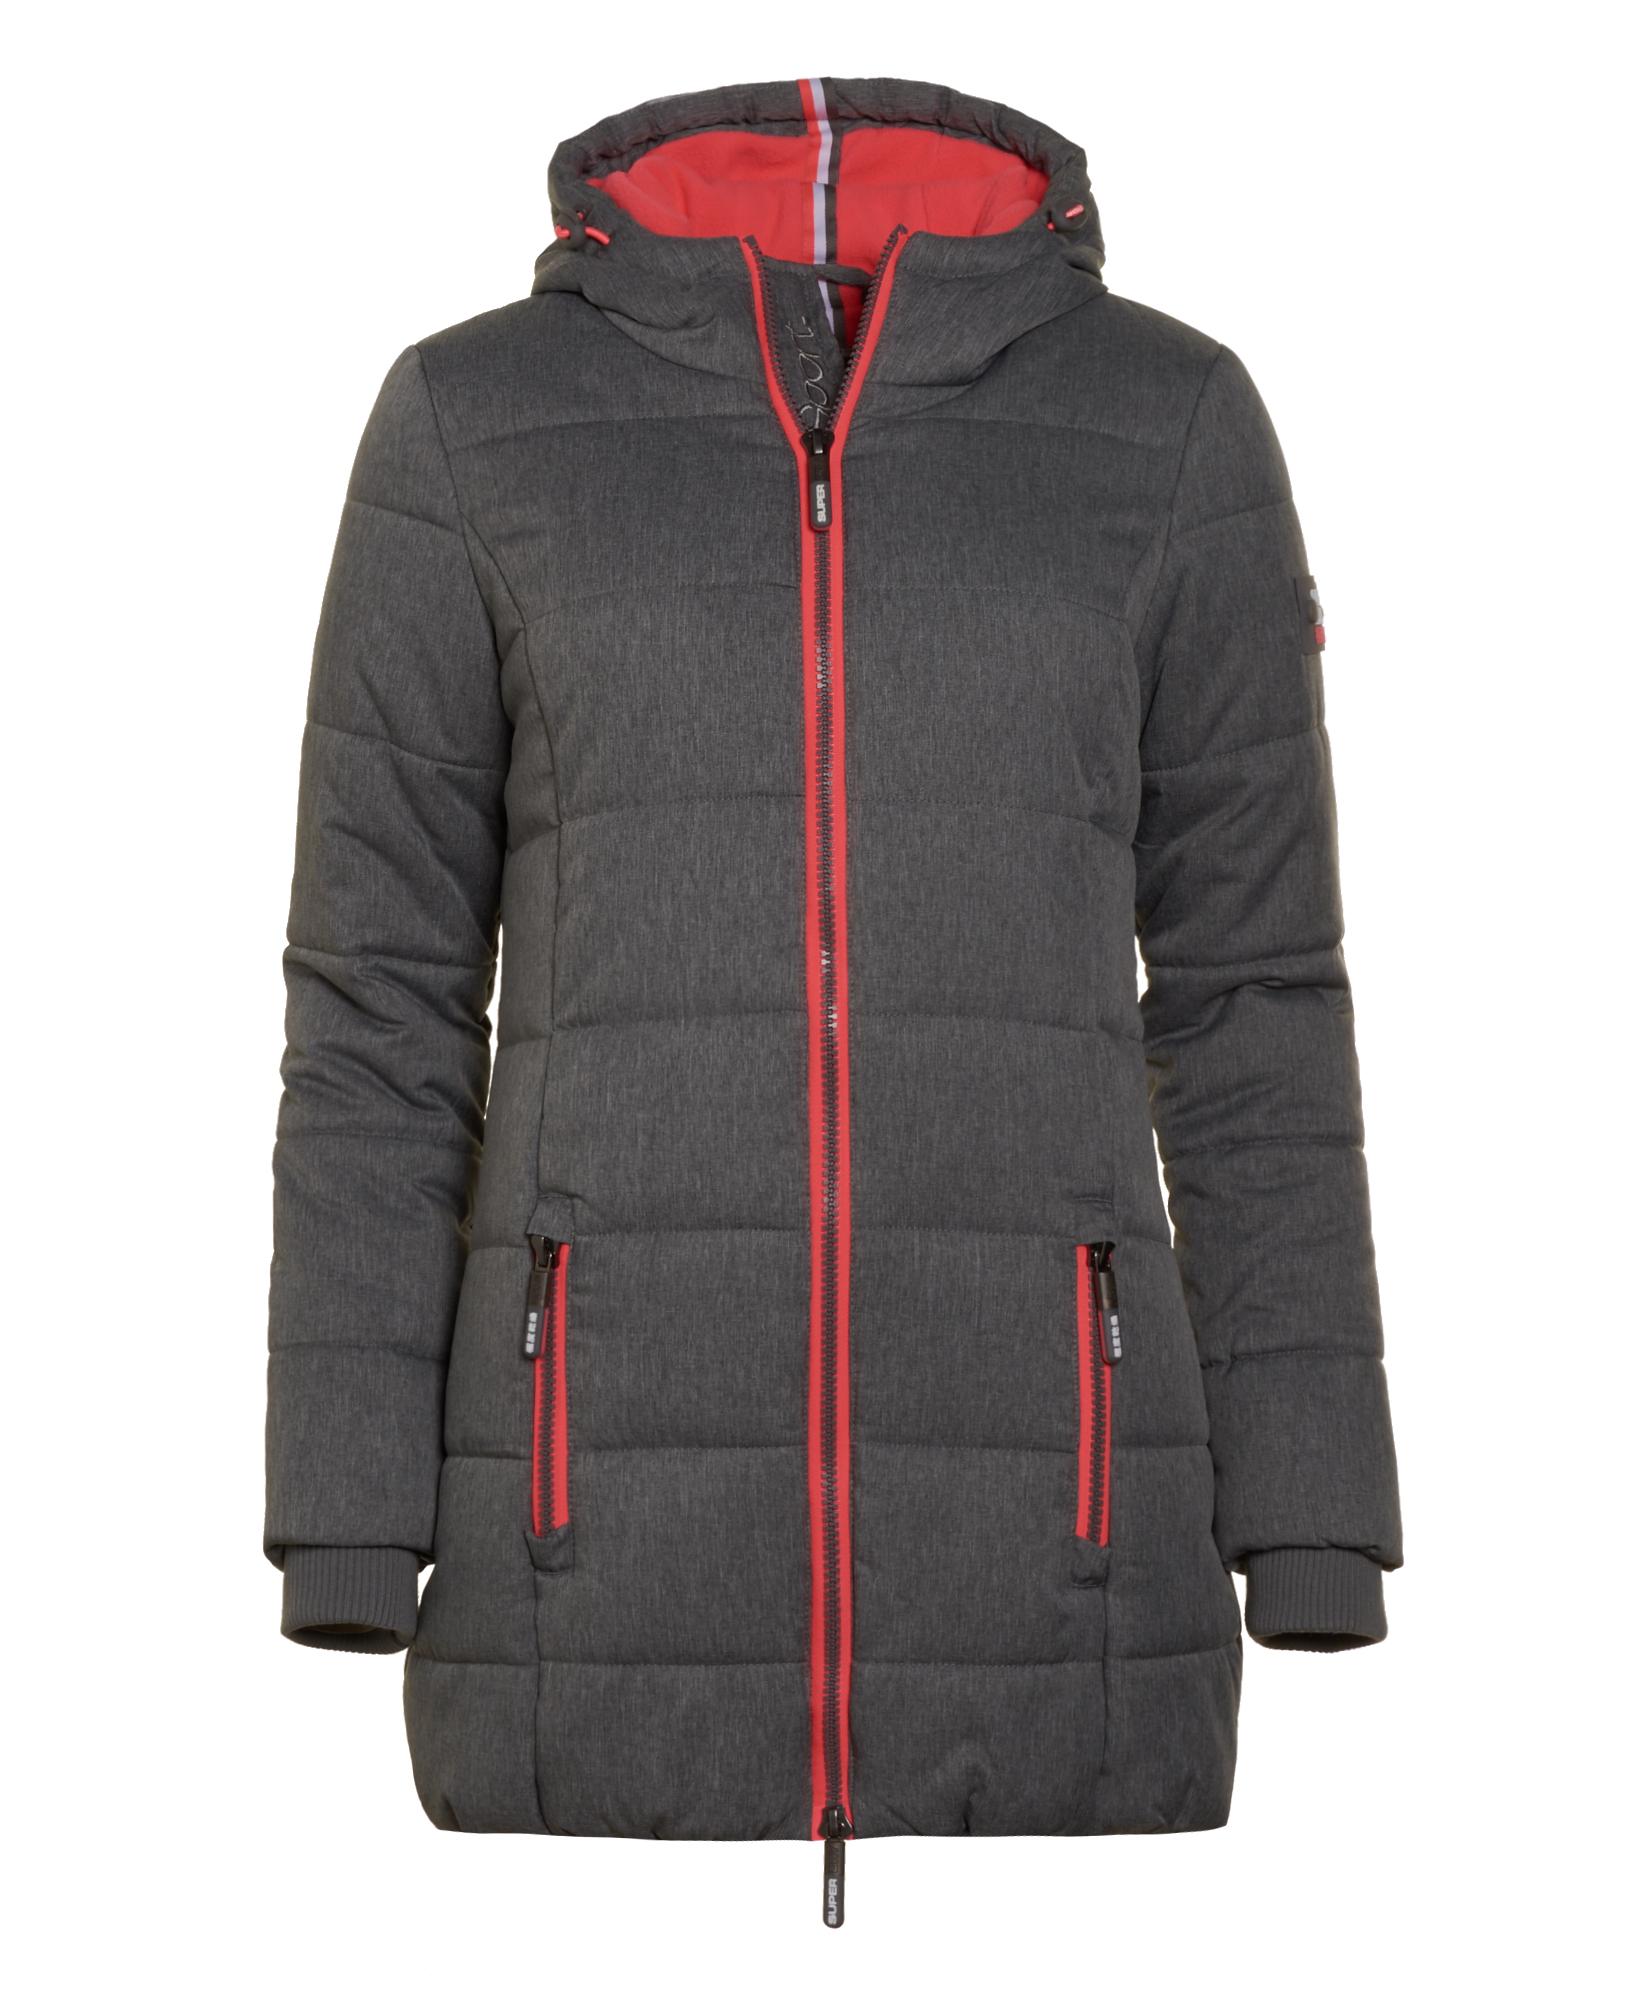 Puffer Superdry Ebay Tall Sports Neue Meliert Grau Damen Jacke q8PpwpI5